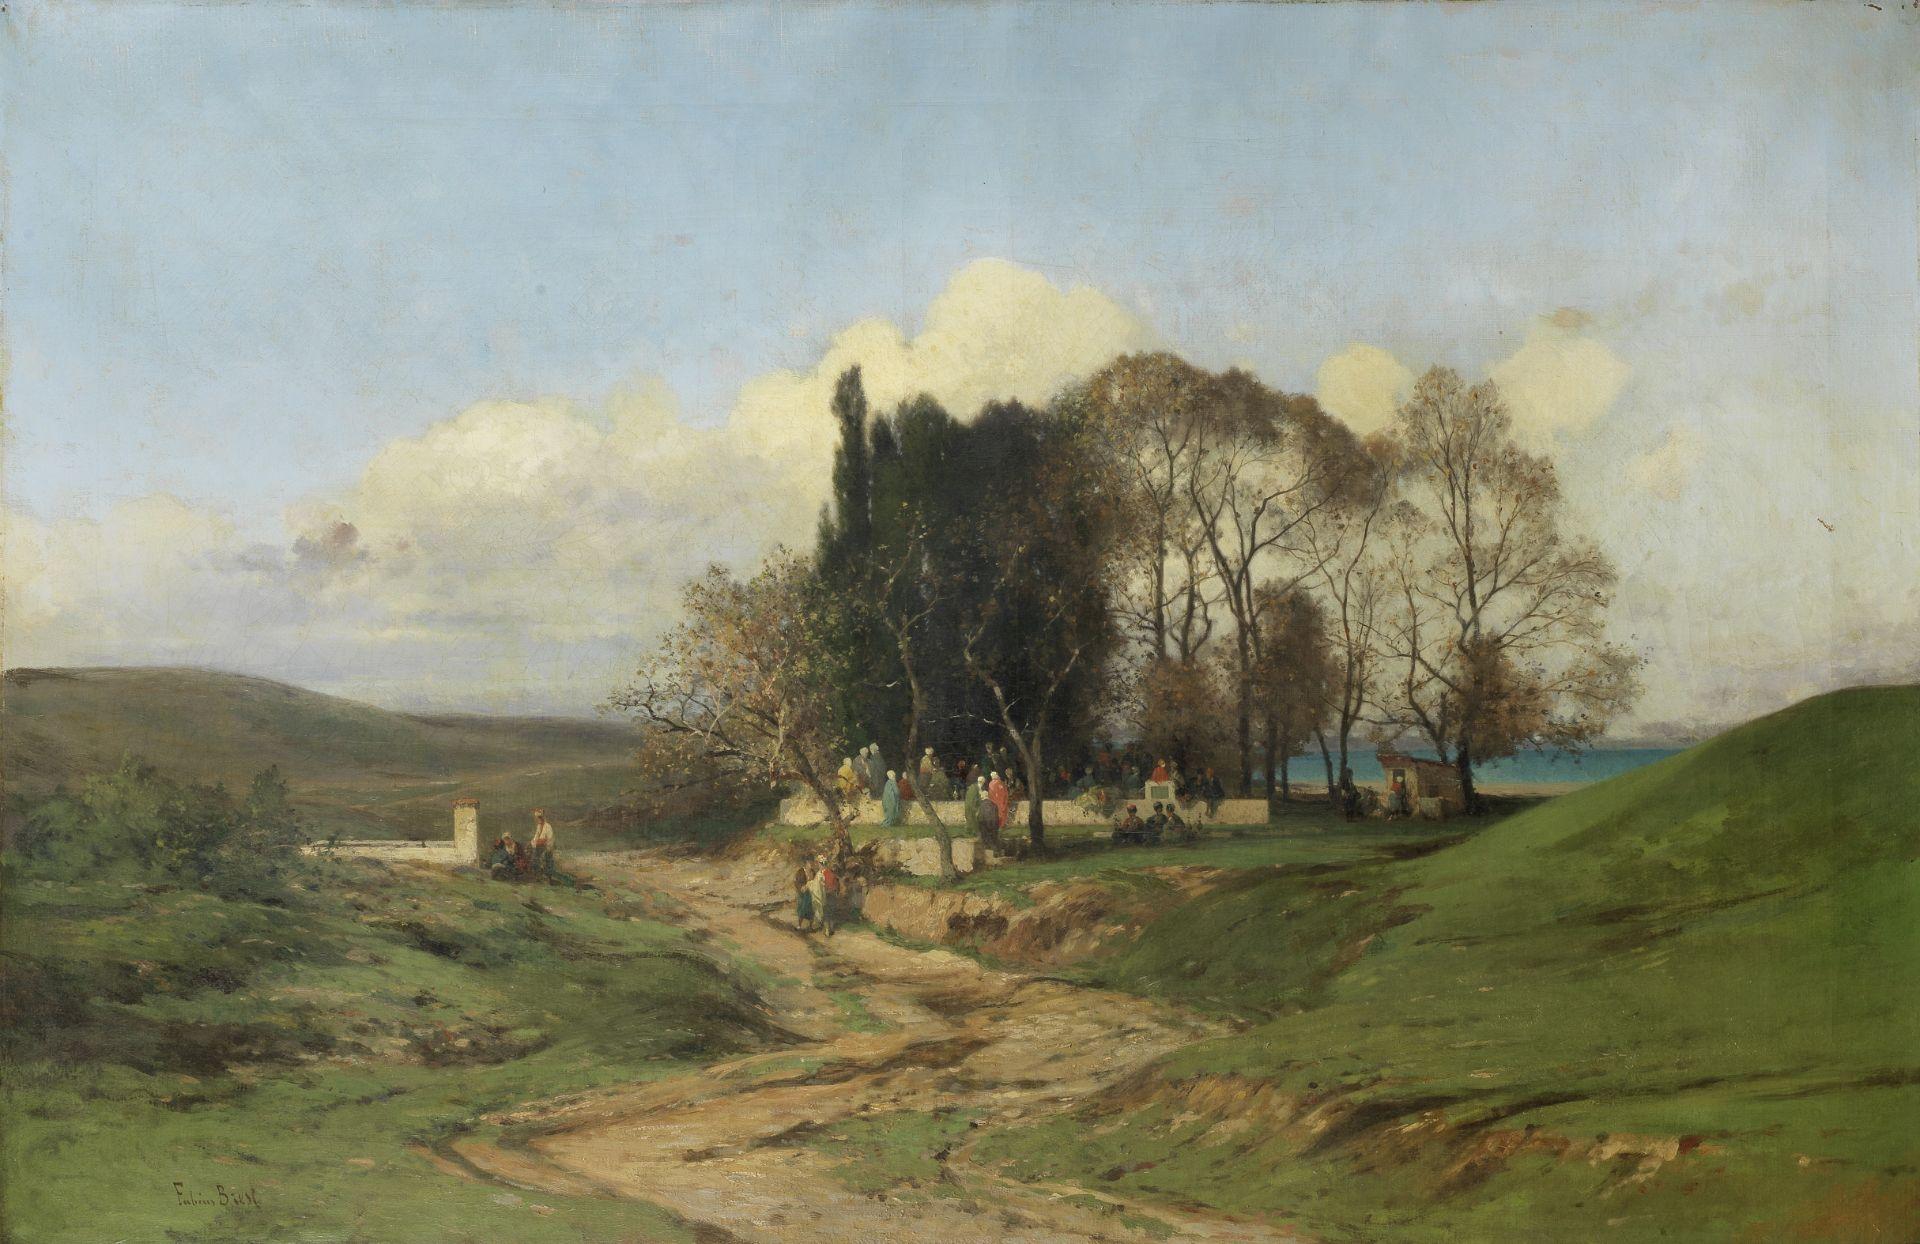 Germain Fabius Brest (French, 1823-1900) A gathering near the Bosphorus